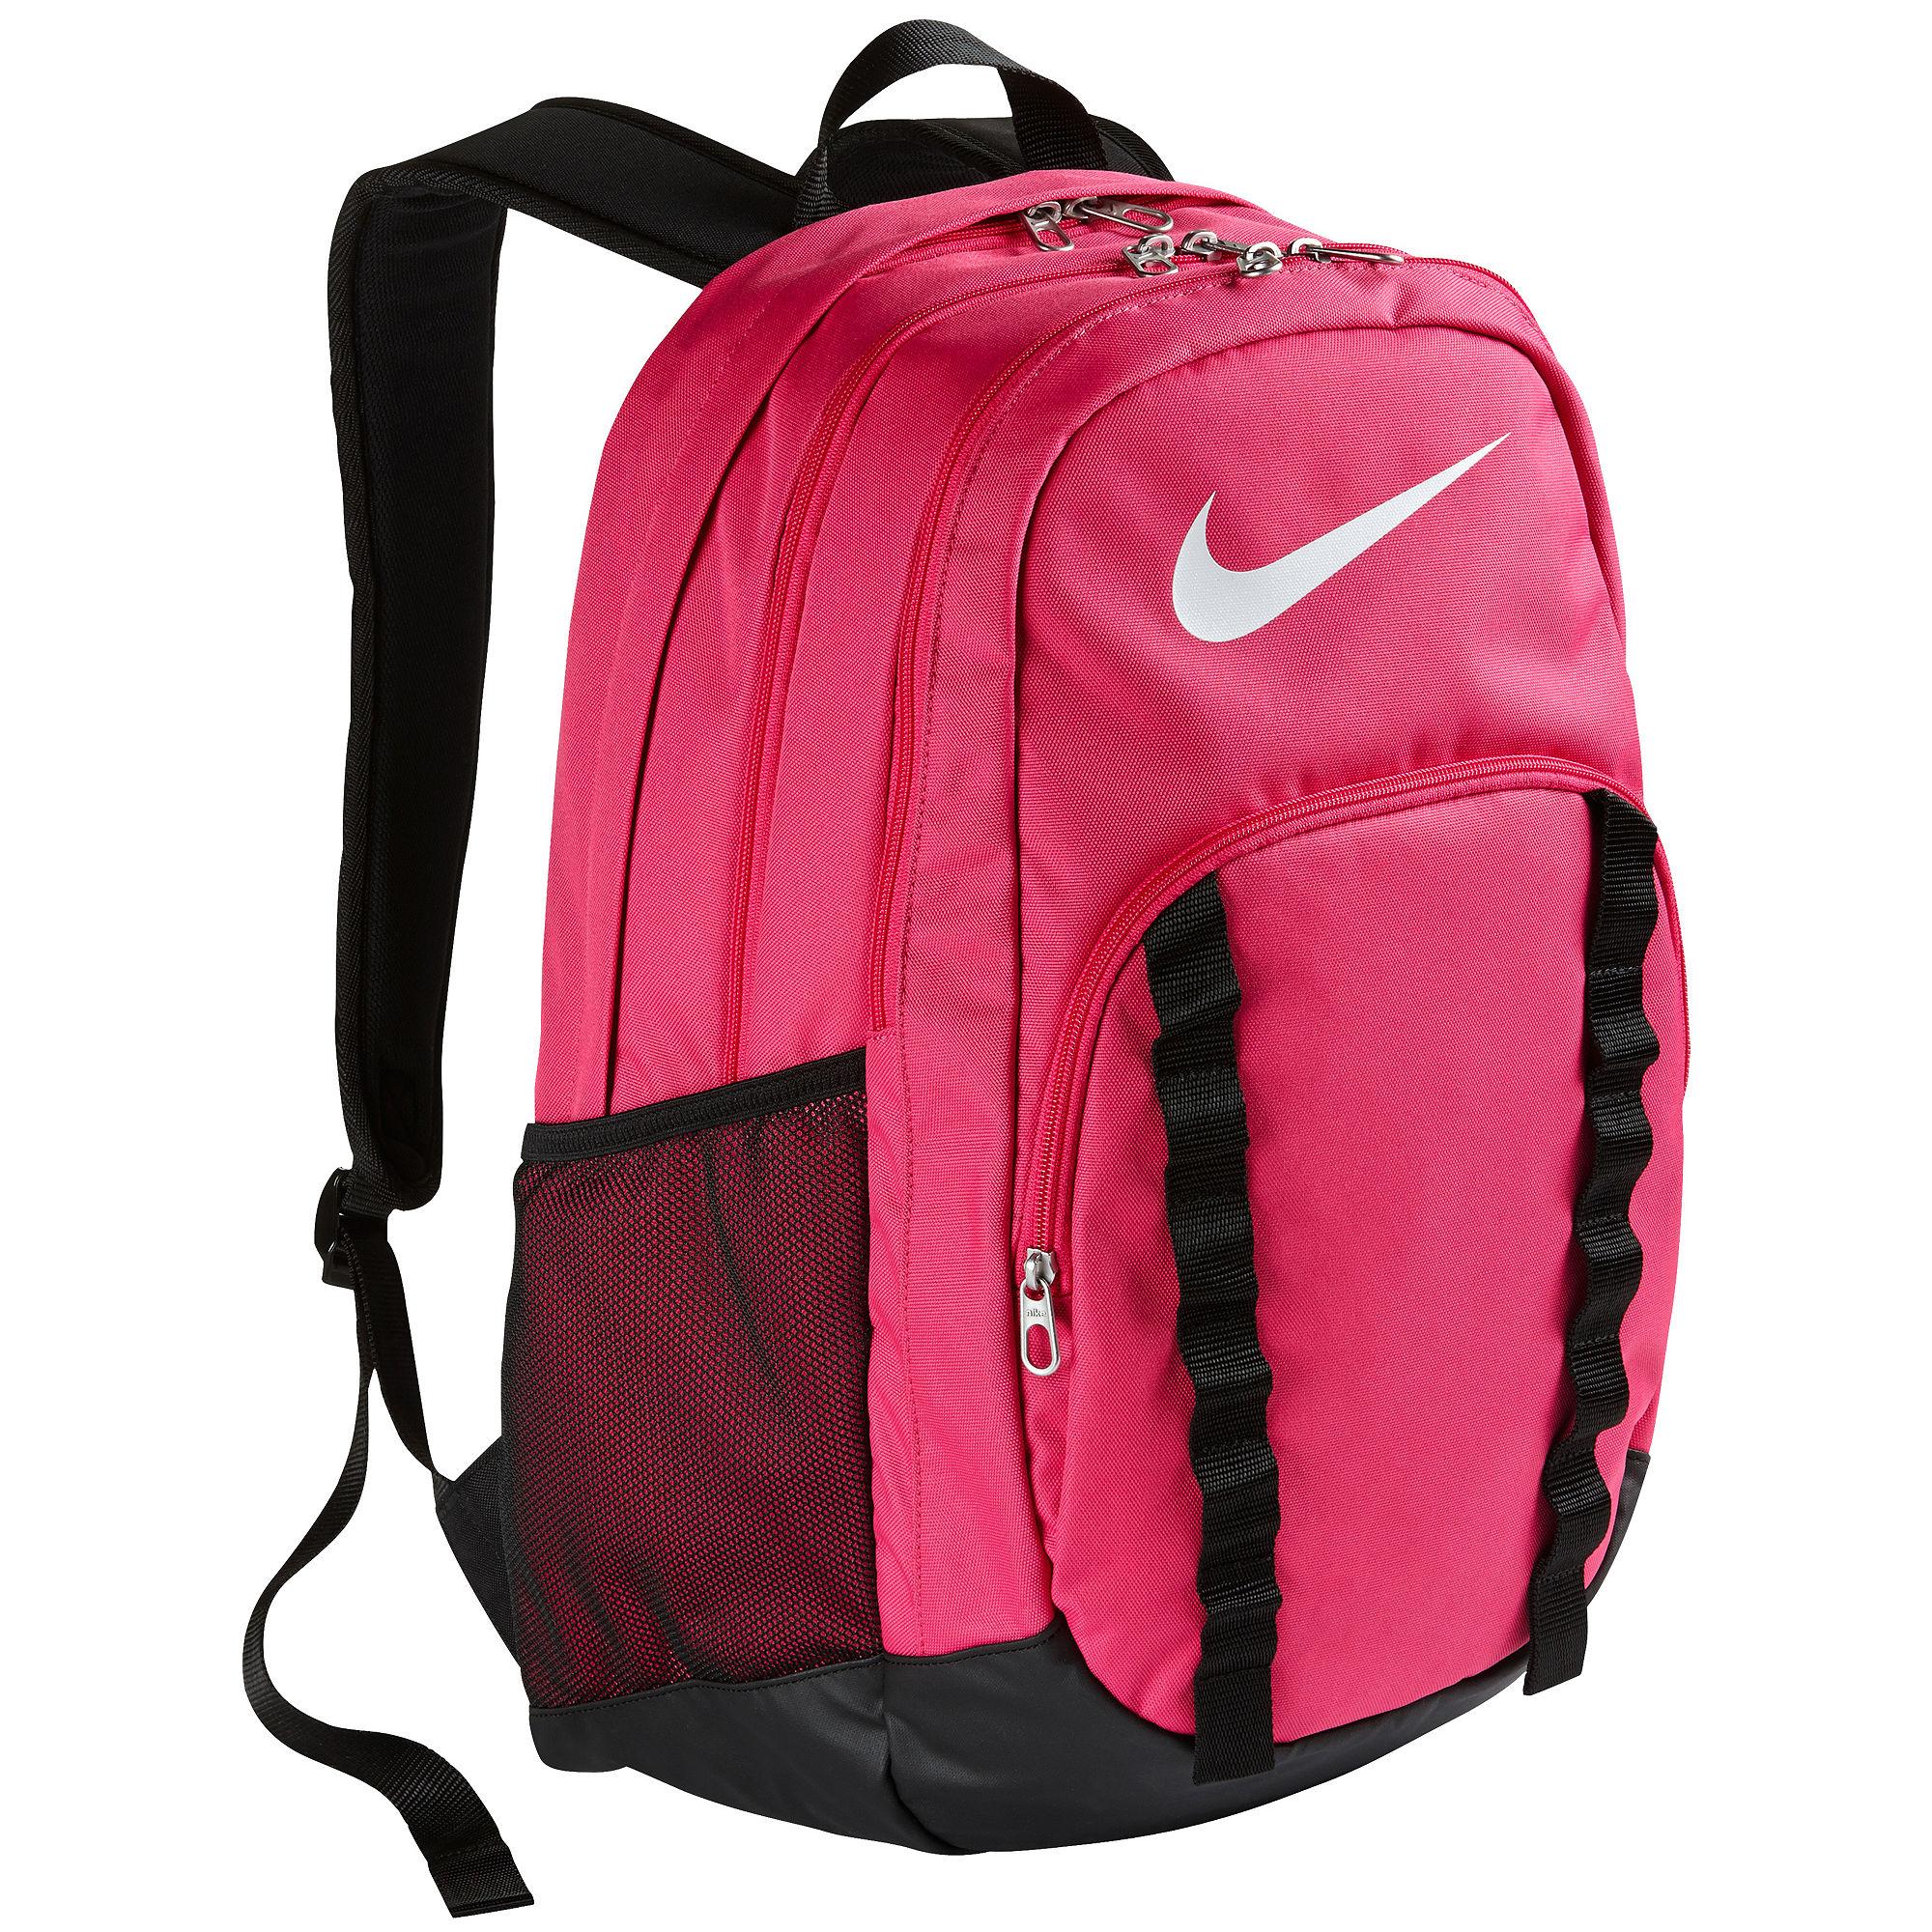 20f65710d03f7 UPC 091202638368 - Nike Brasilia XL Backpack